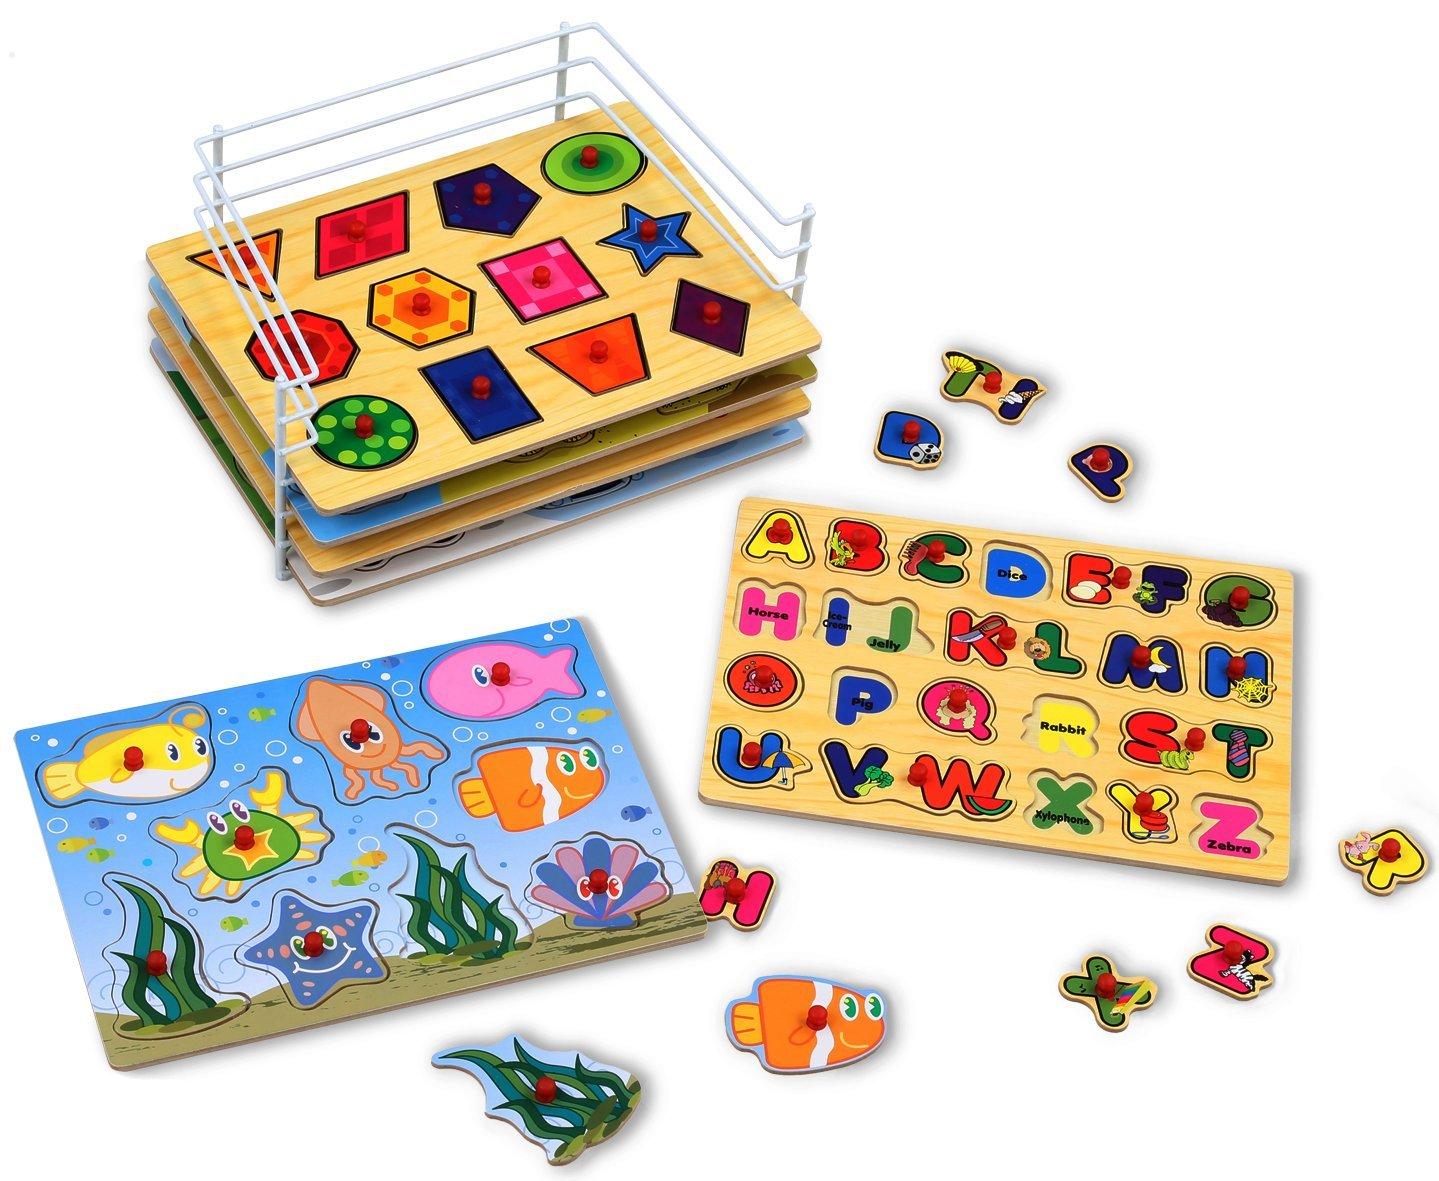 KLEEGER Baby Peg Puzzle Set - 6 Educational Knob Puzzles For Boy & Girl Toddlers - Alphabet, Numbers, Sea Life, Dinosaurs, Shapes & Vehicles - Bonus: Storage Rack